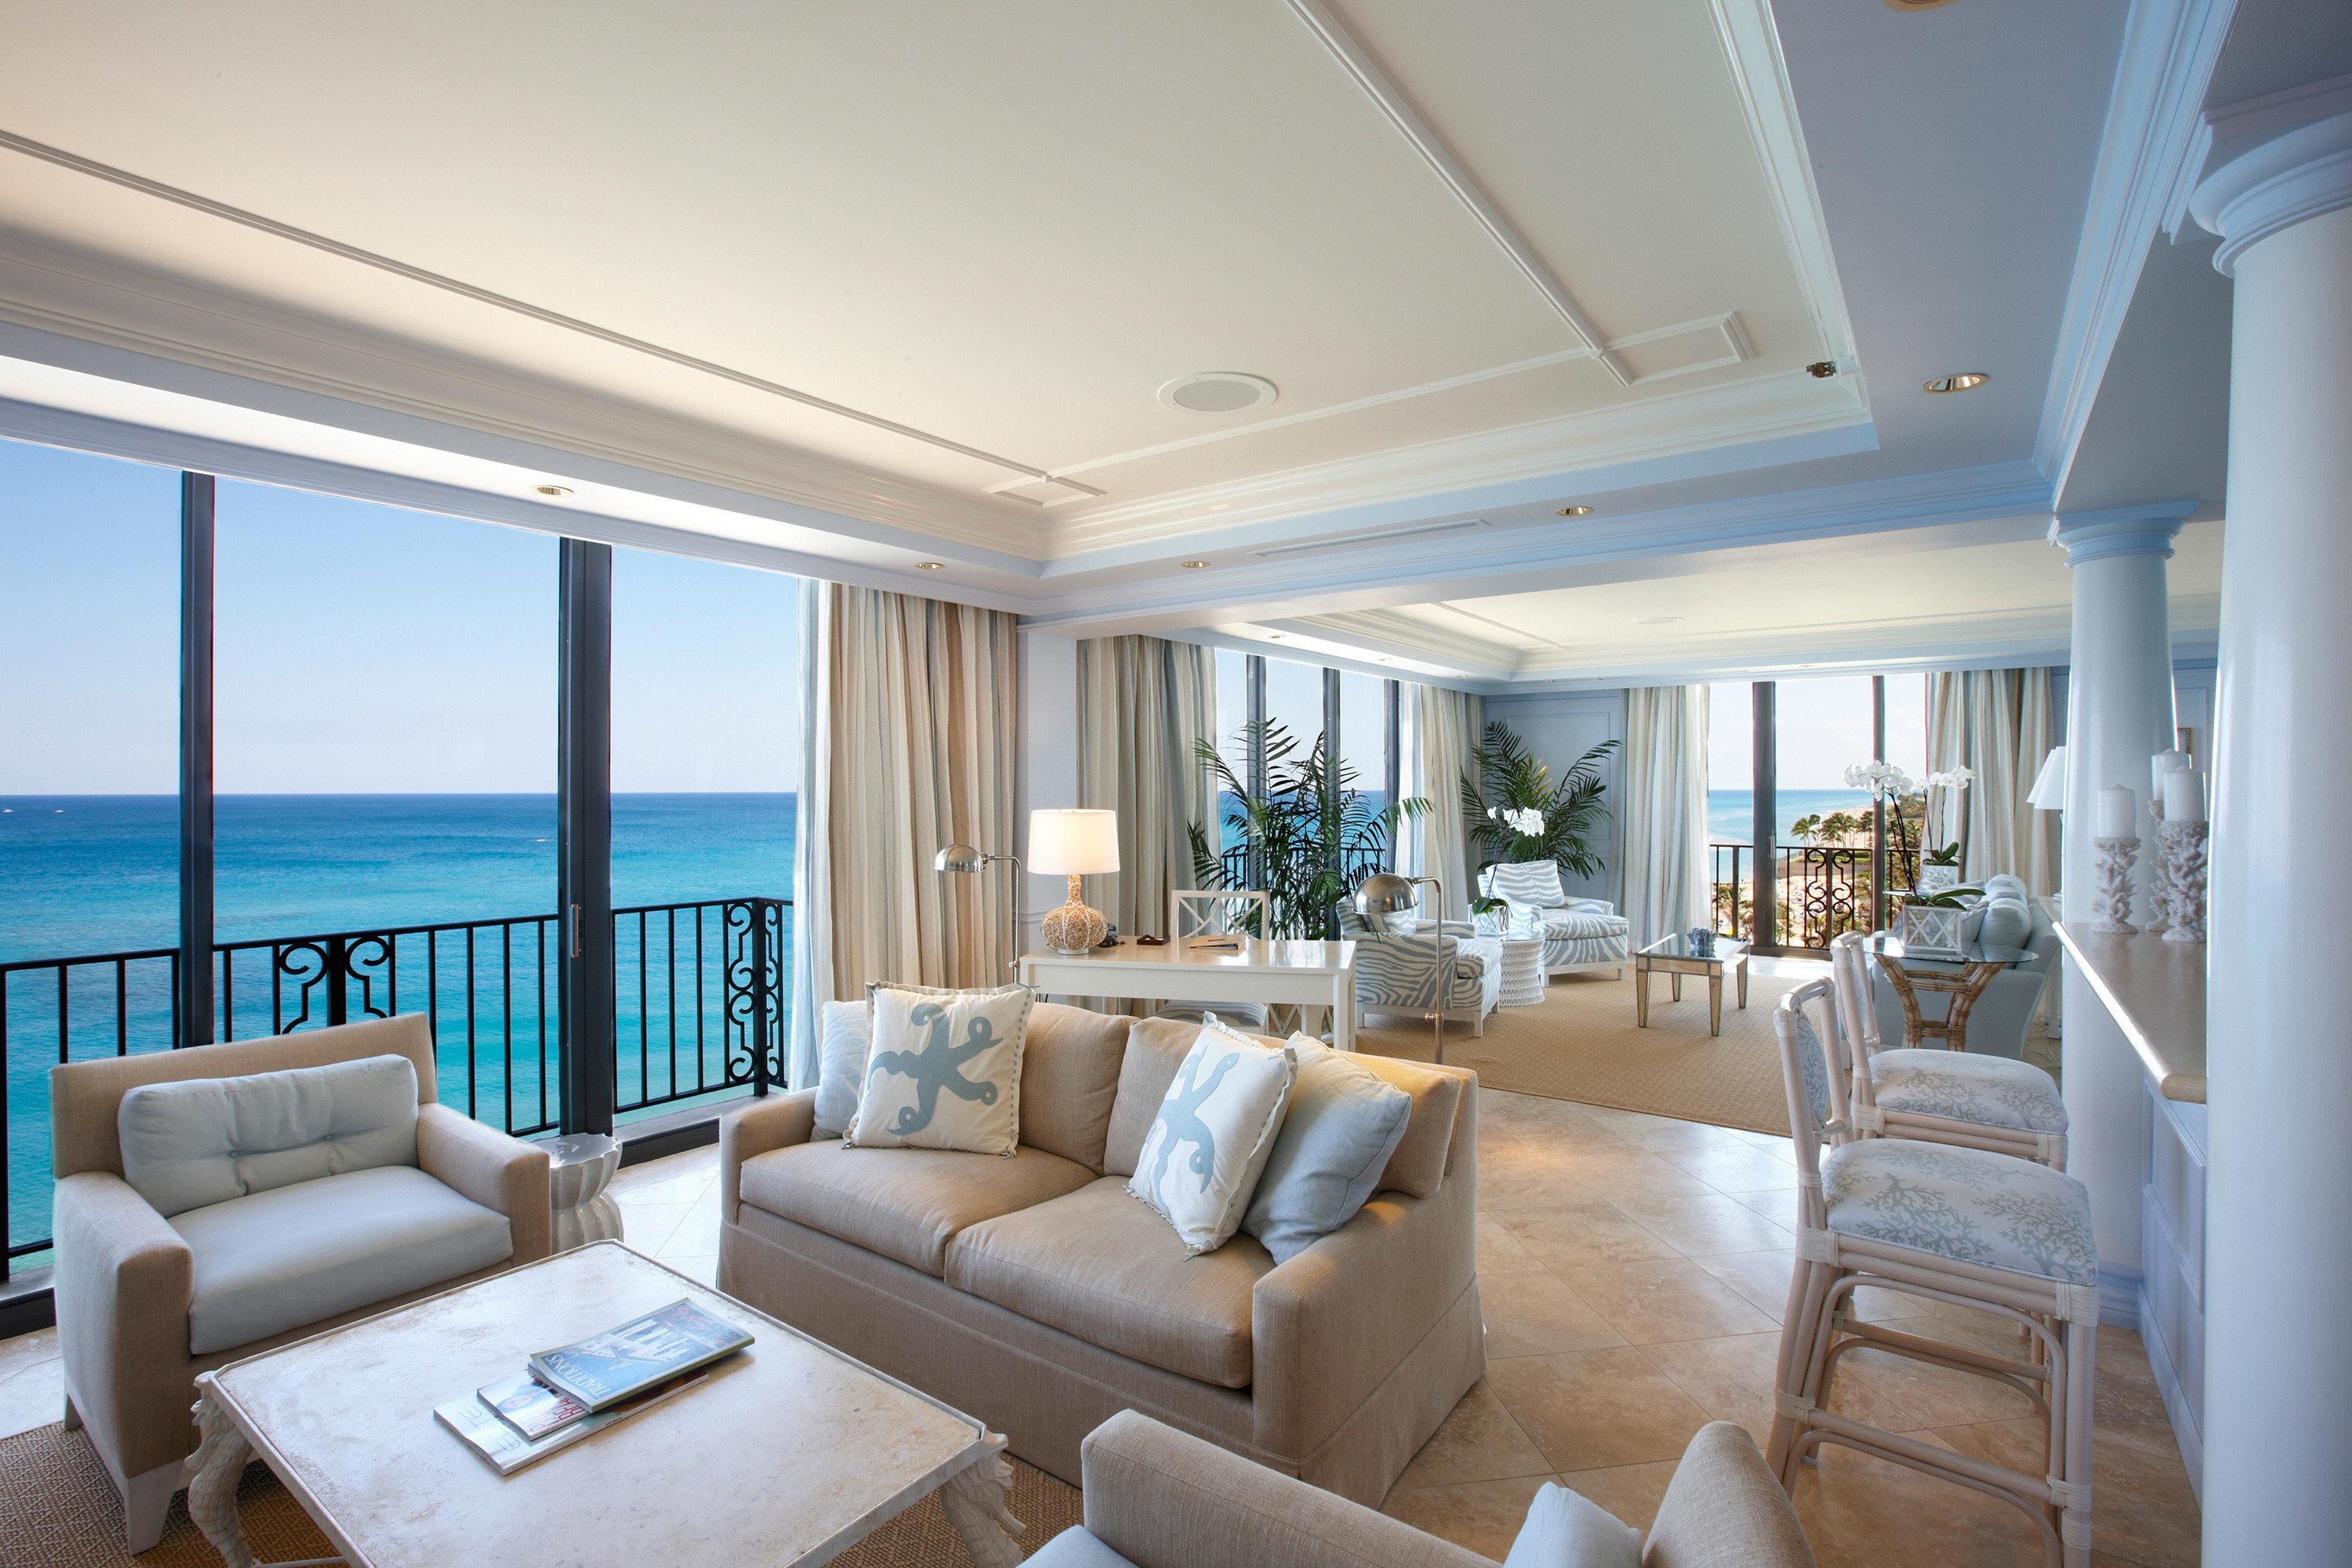 Bar Dining Drink Eat Hotels Luxury Trip Ideas sofa property living room condominium home Suite Villa daylighting mansion